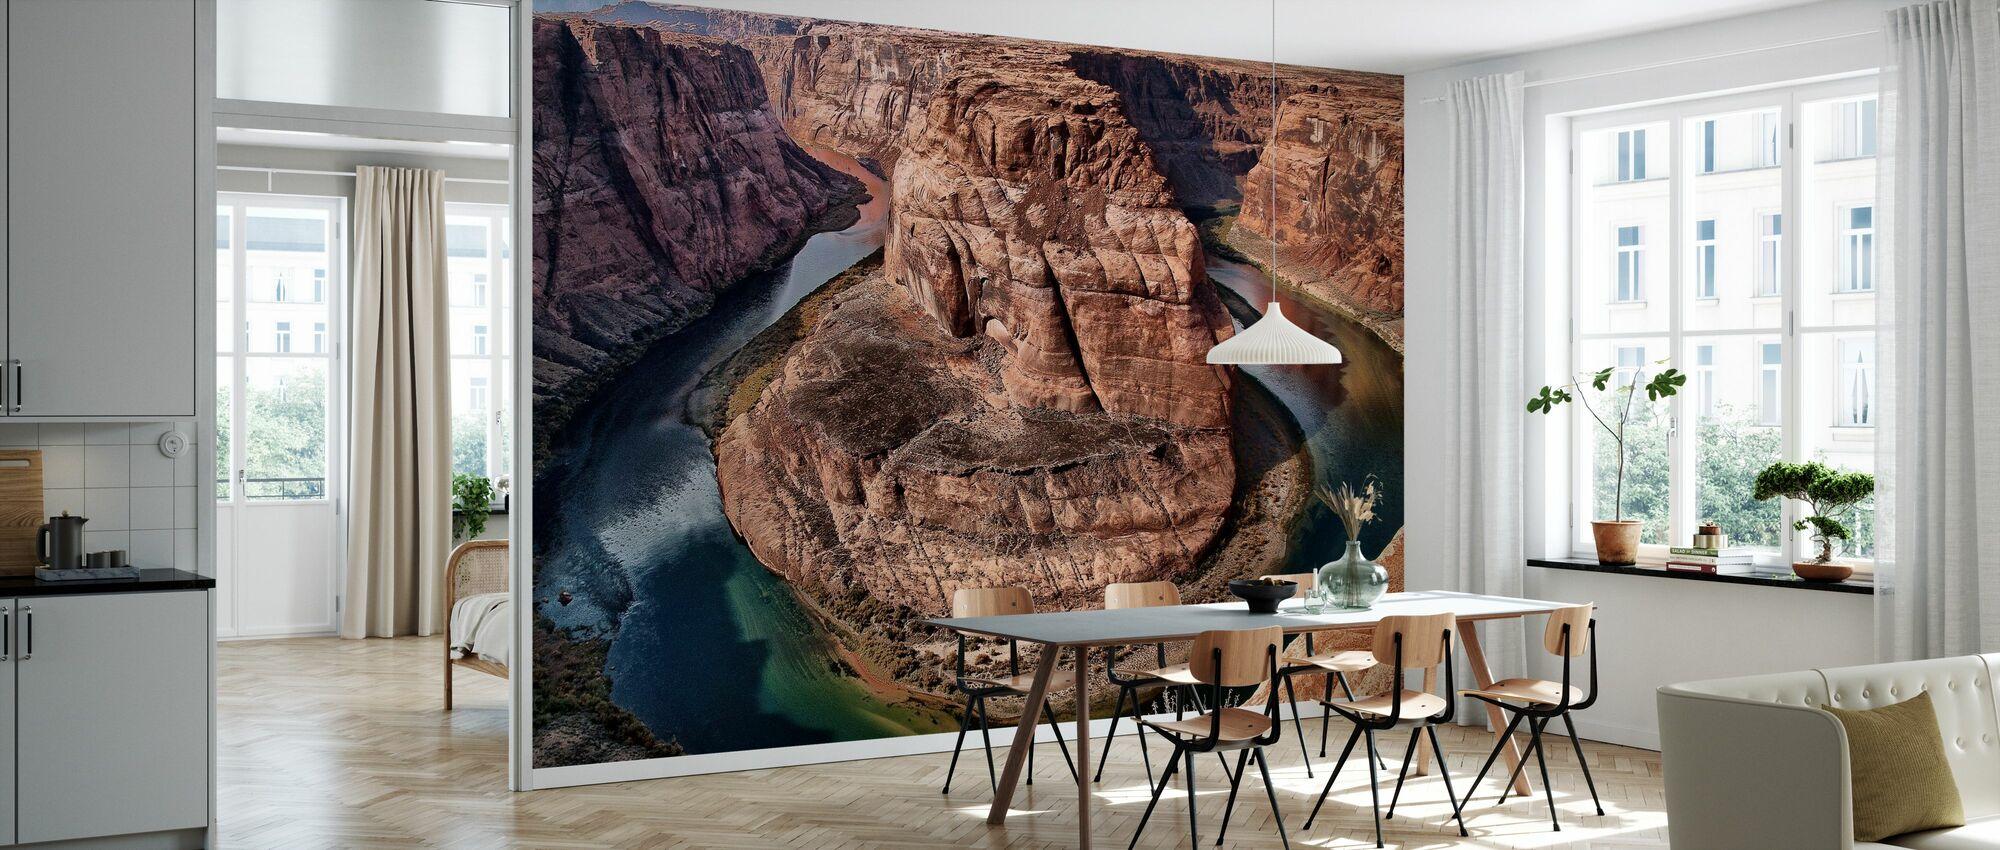 Horshoe Bend - Wallpaper - Kitchen